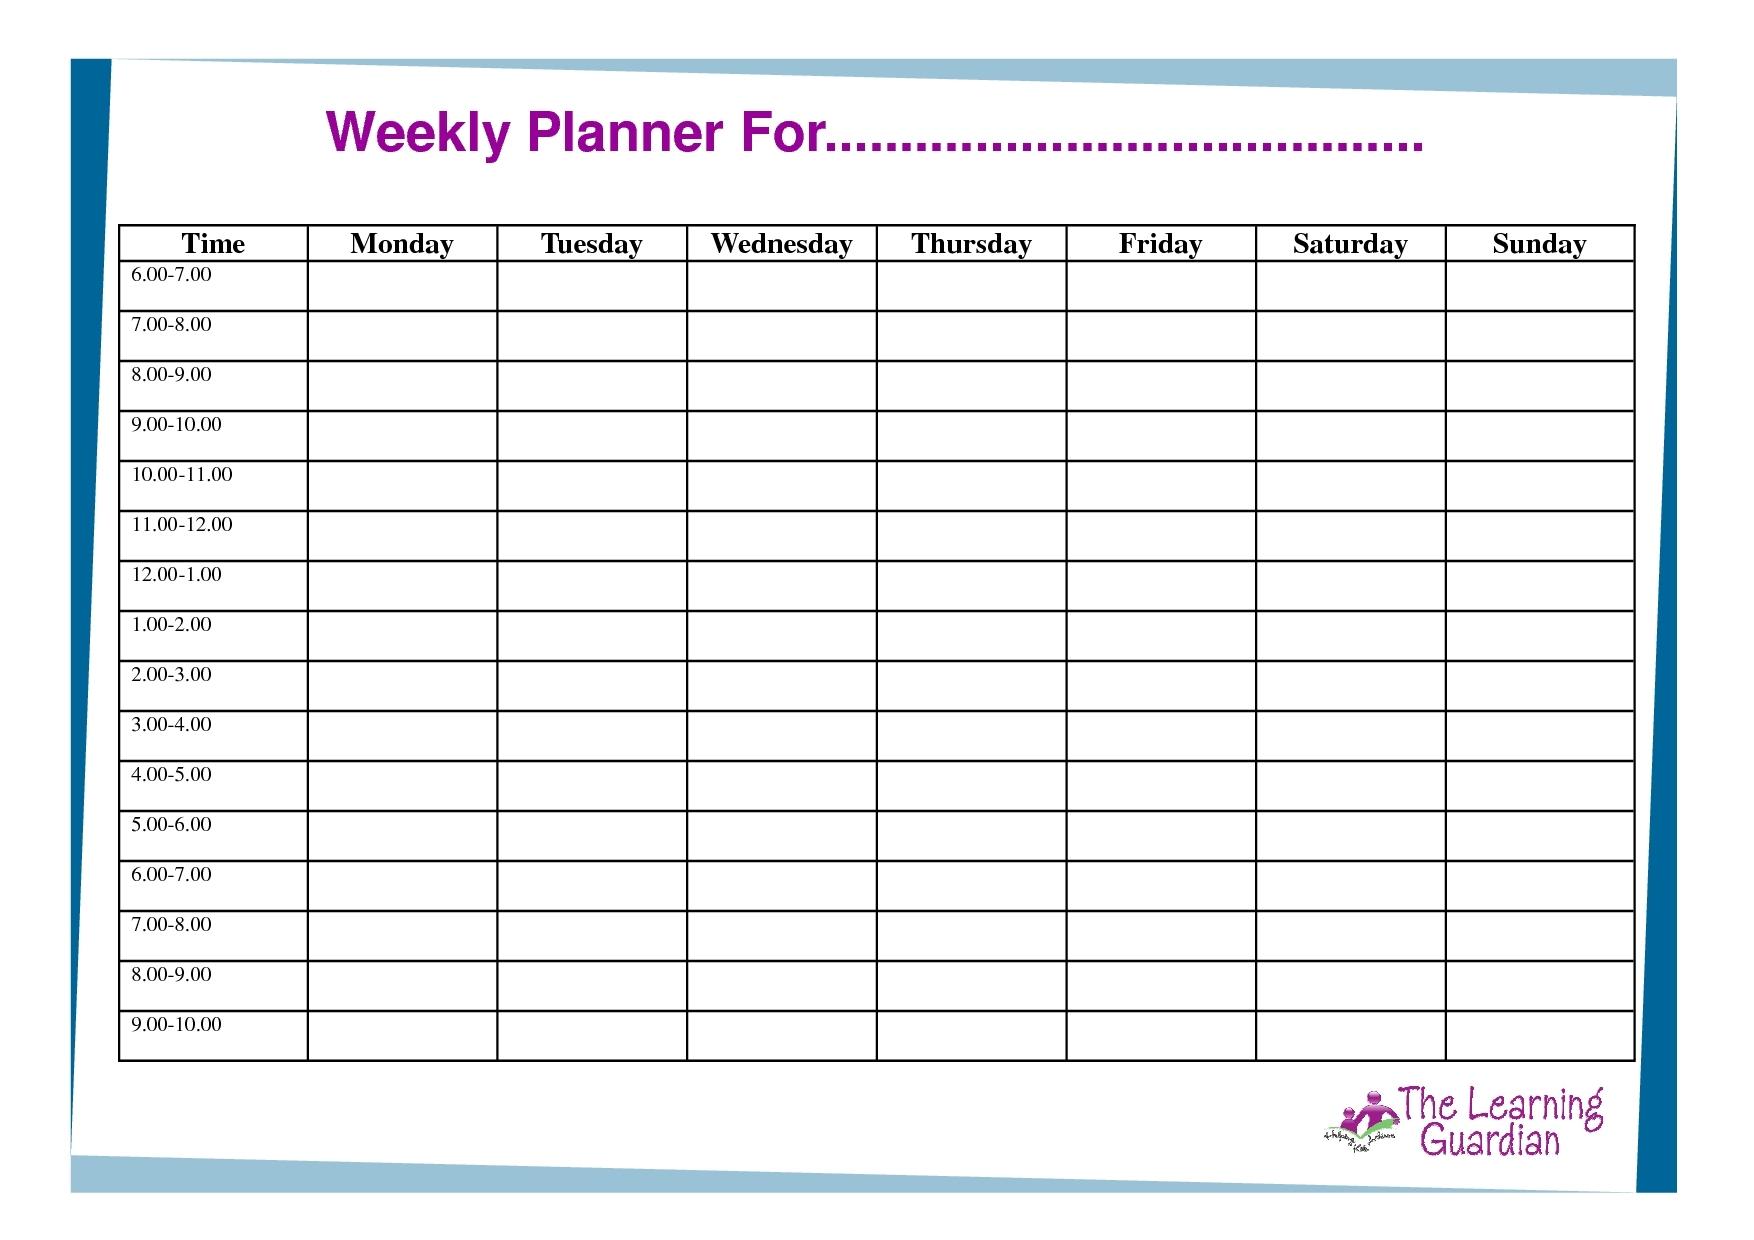 Schedule Template Free Day Calendar Printable Week | Smorad with regard to Blank 7 Day Week Calendar